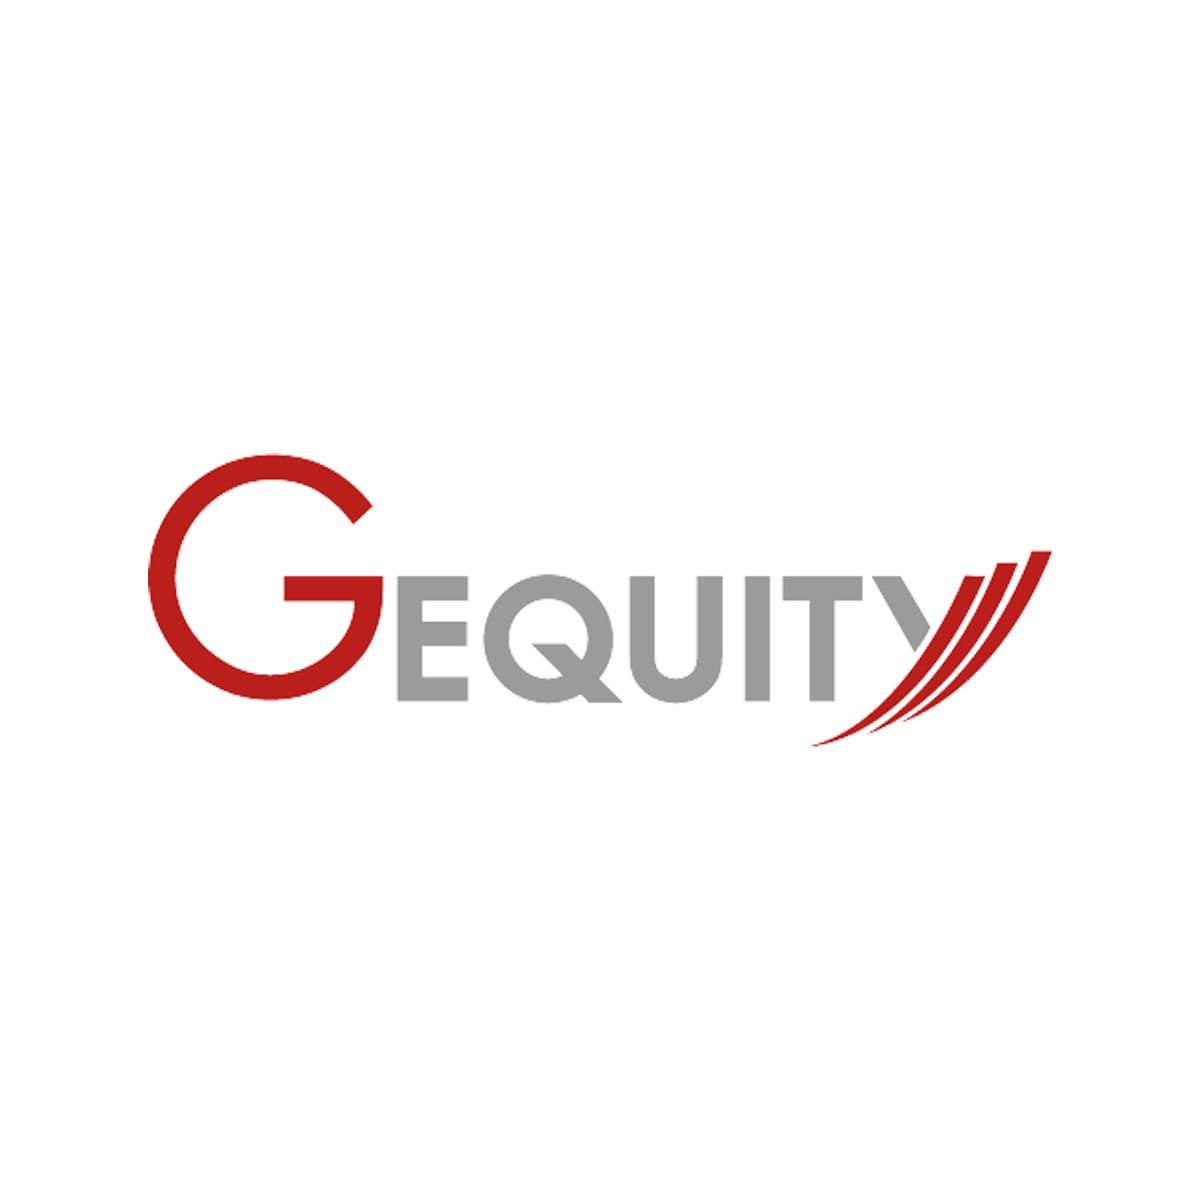 GEquity, i conti del 2020